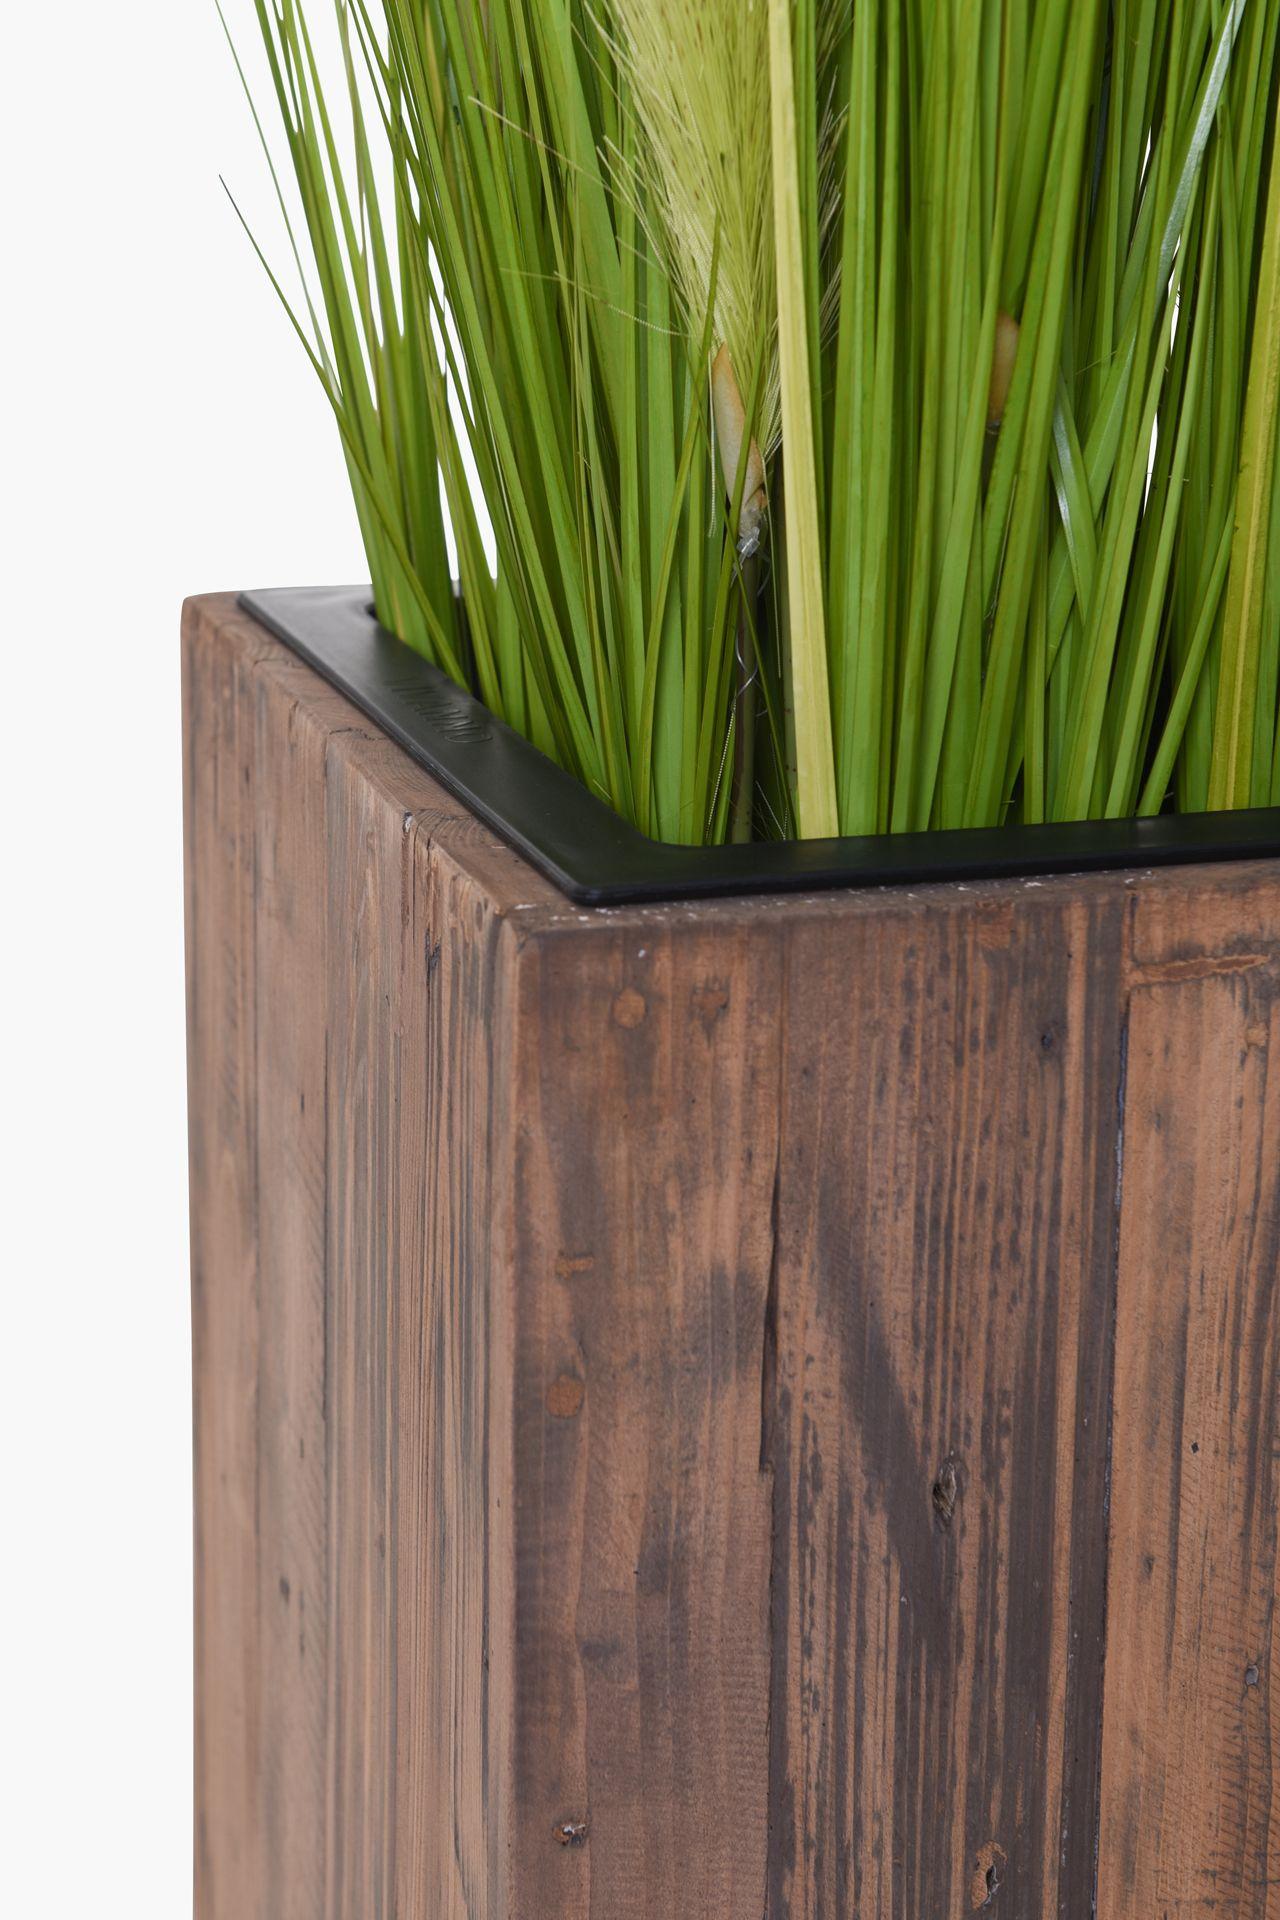 pflanzk bel raumteiler sichtschutz aus recycling holz elemento 90 antik braun 4260472225318. Black Bedroom Furniture Sets. Home Design Ideas